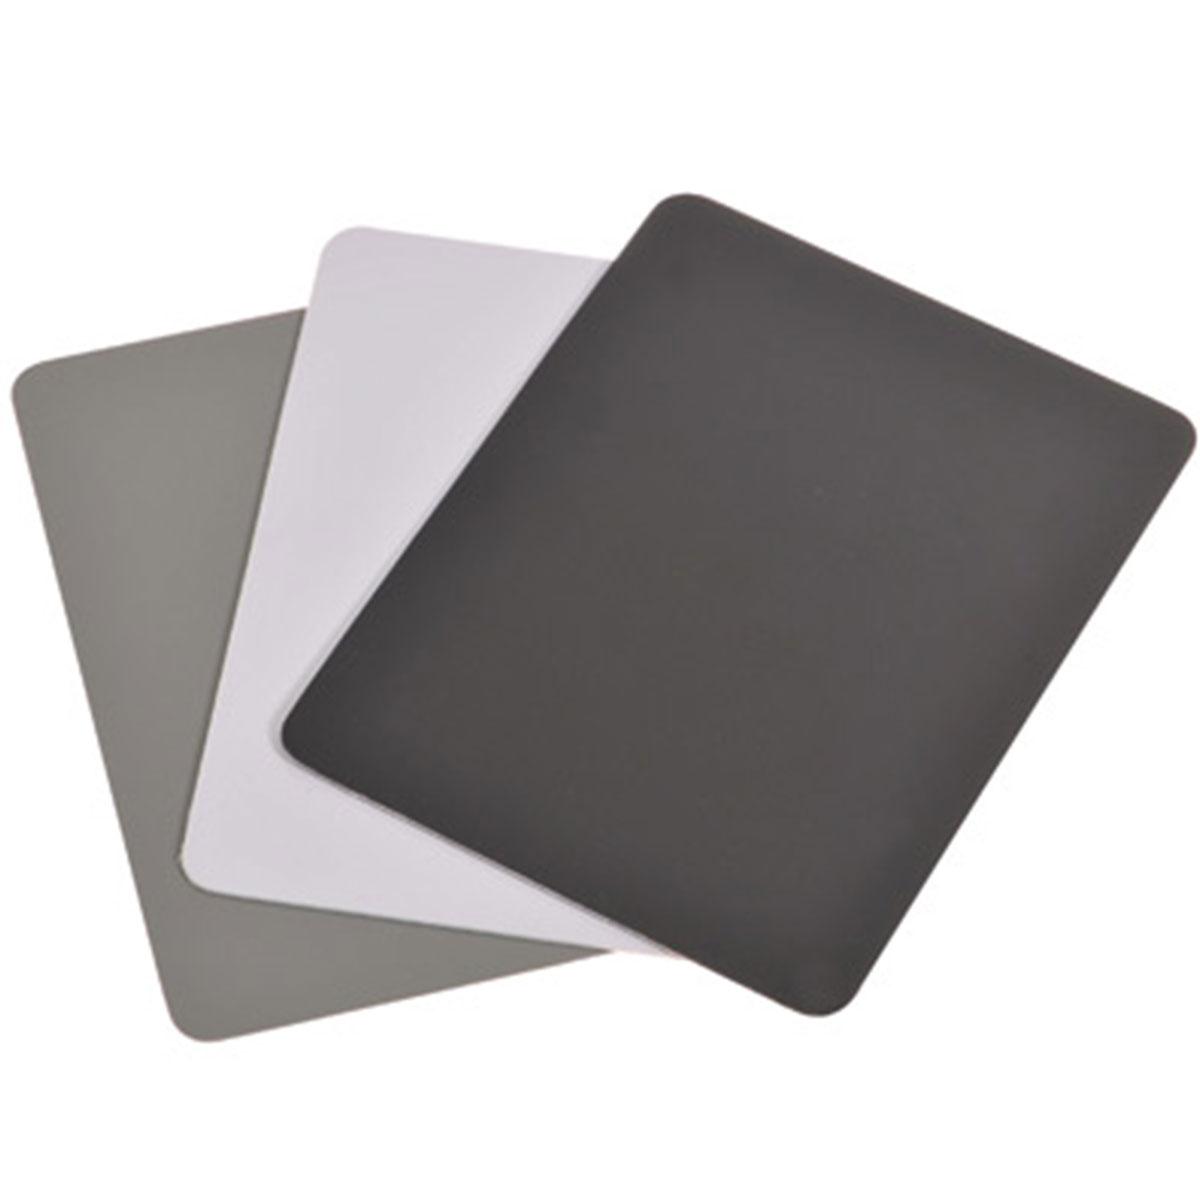 B.I.G. Kunststoff-Graukartenset 10x13cm